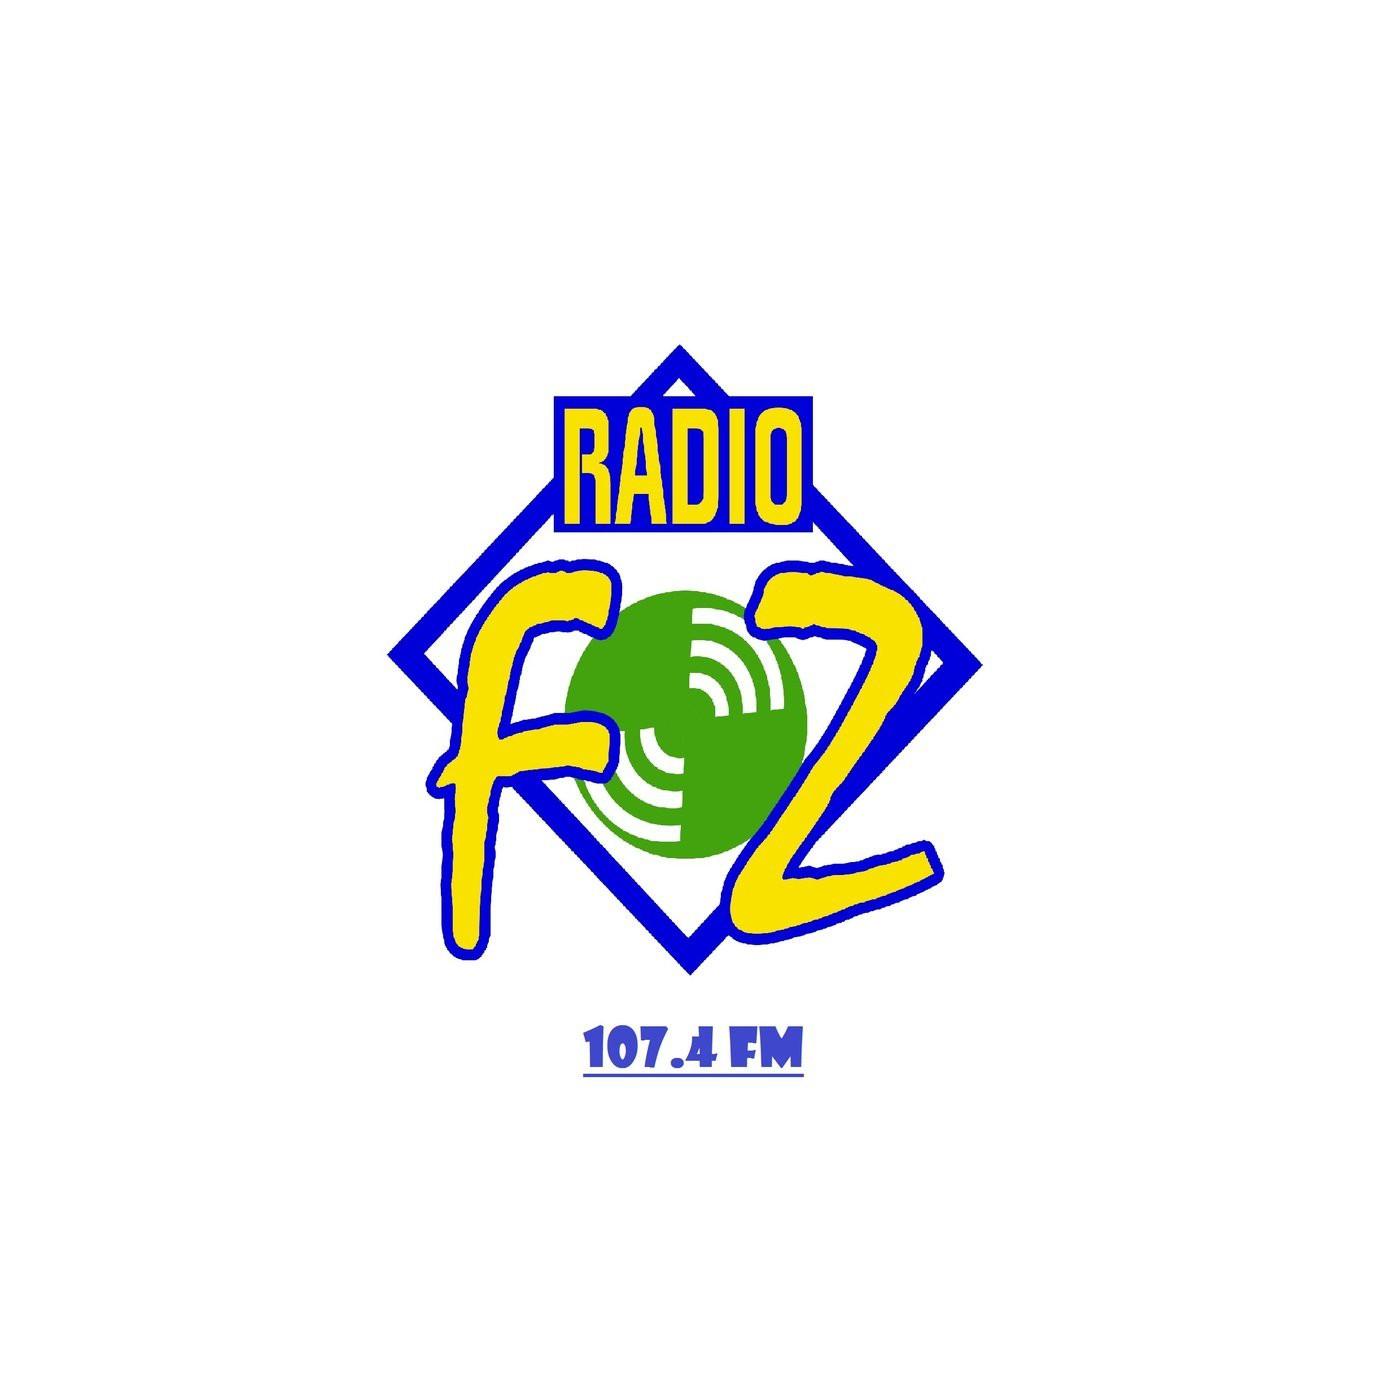 Escucha Podcast Radio Foz - iVoox